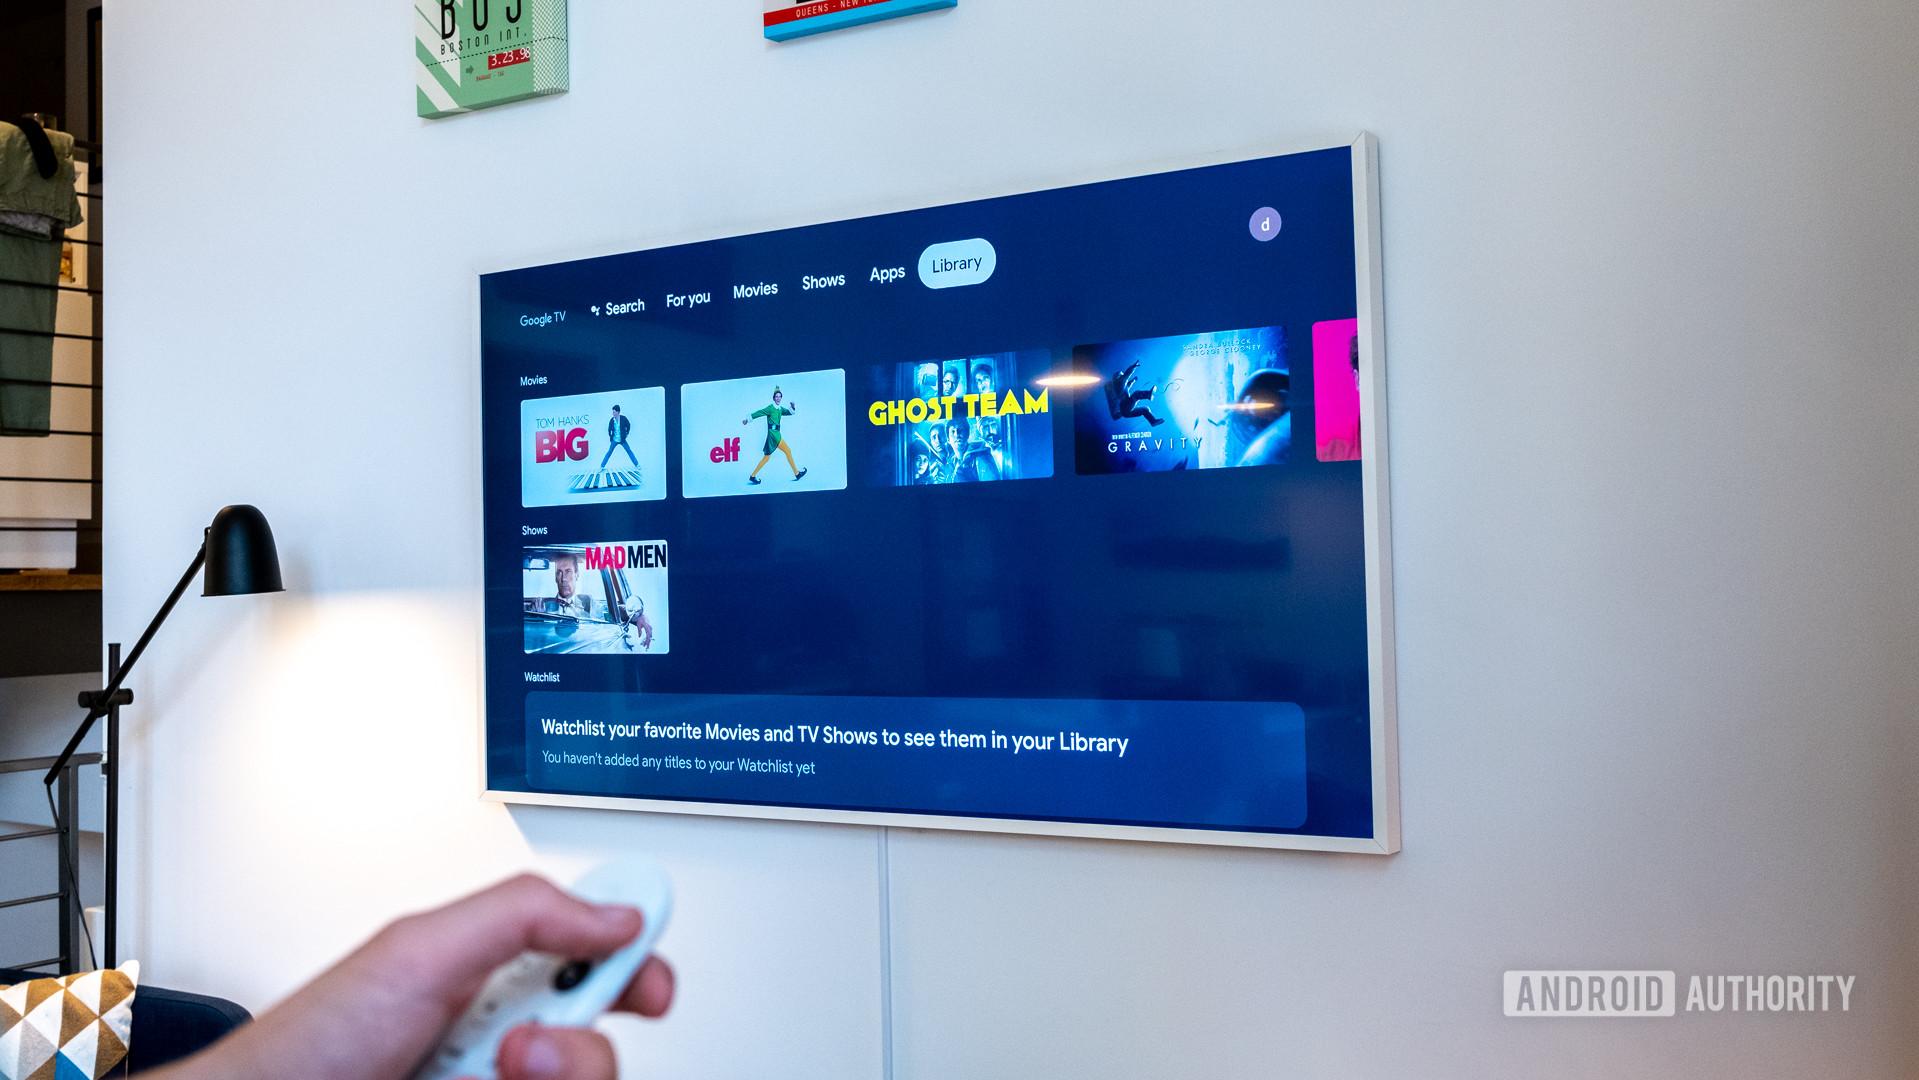 Google Chromecast with Google TV library tab